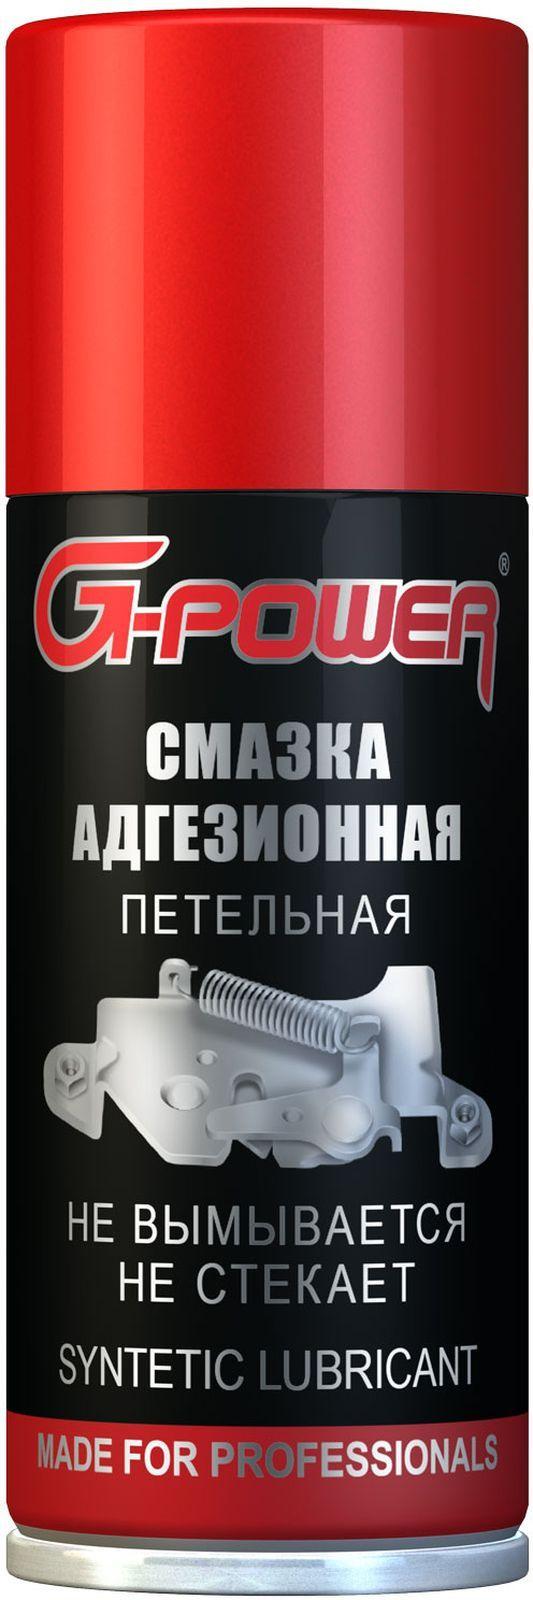 Смазка G-Power, 210 мл